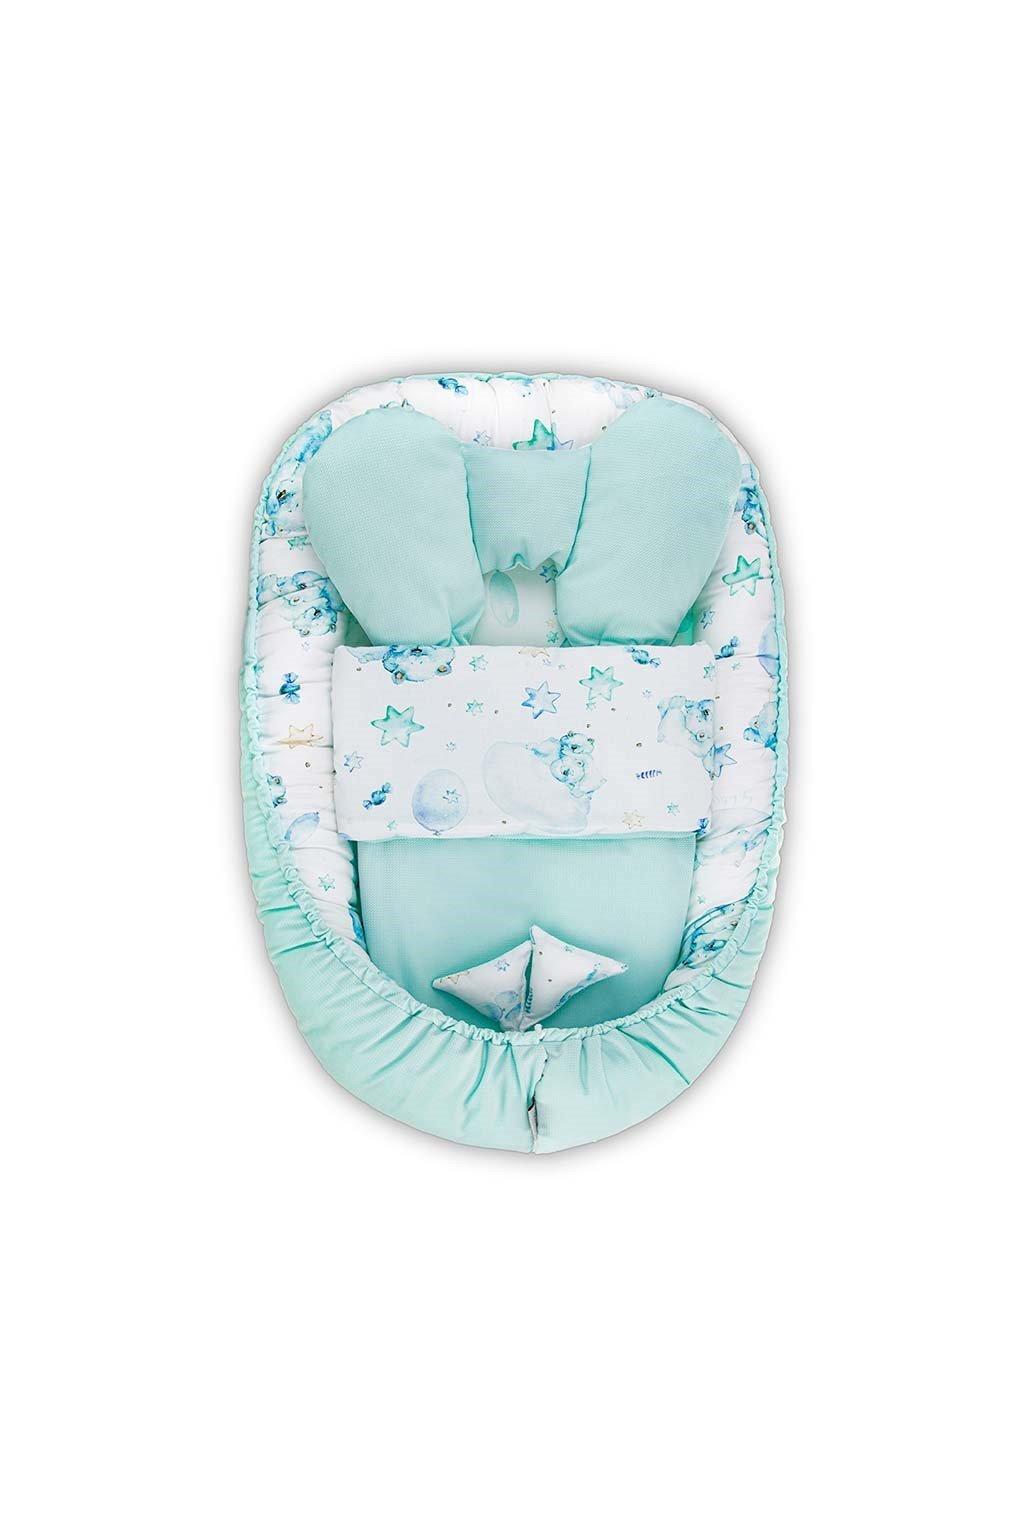 Hniezdočko s perinkou pre bábätko Velvet Belisima Sleeping bears